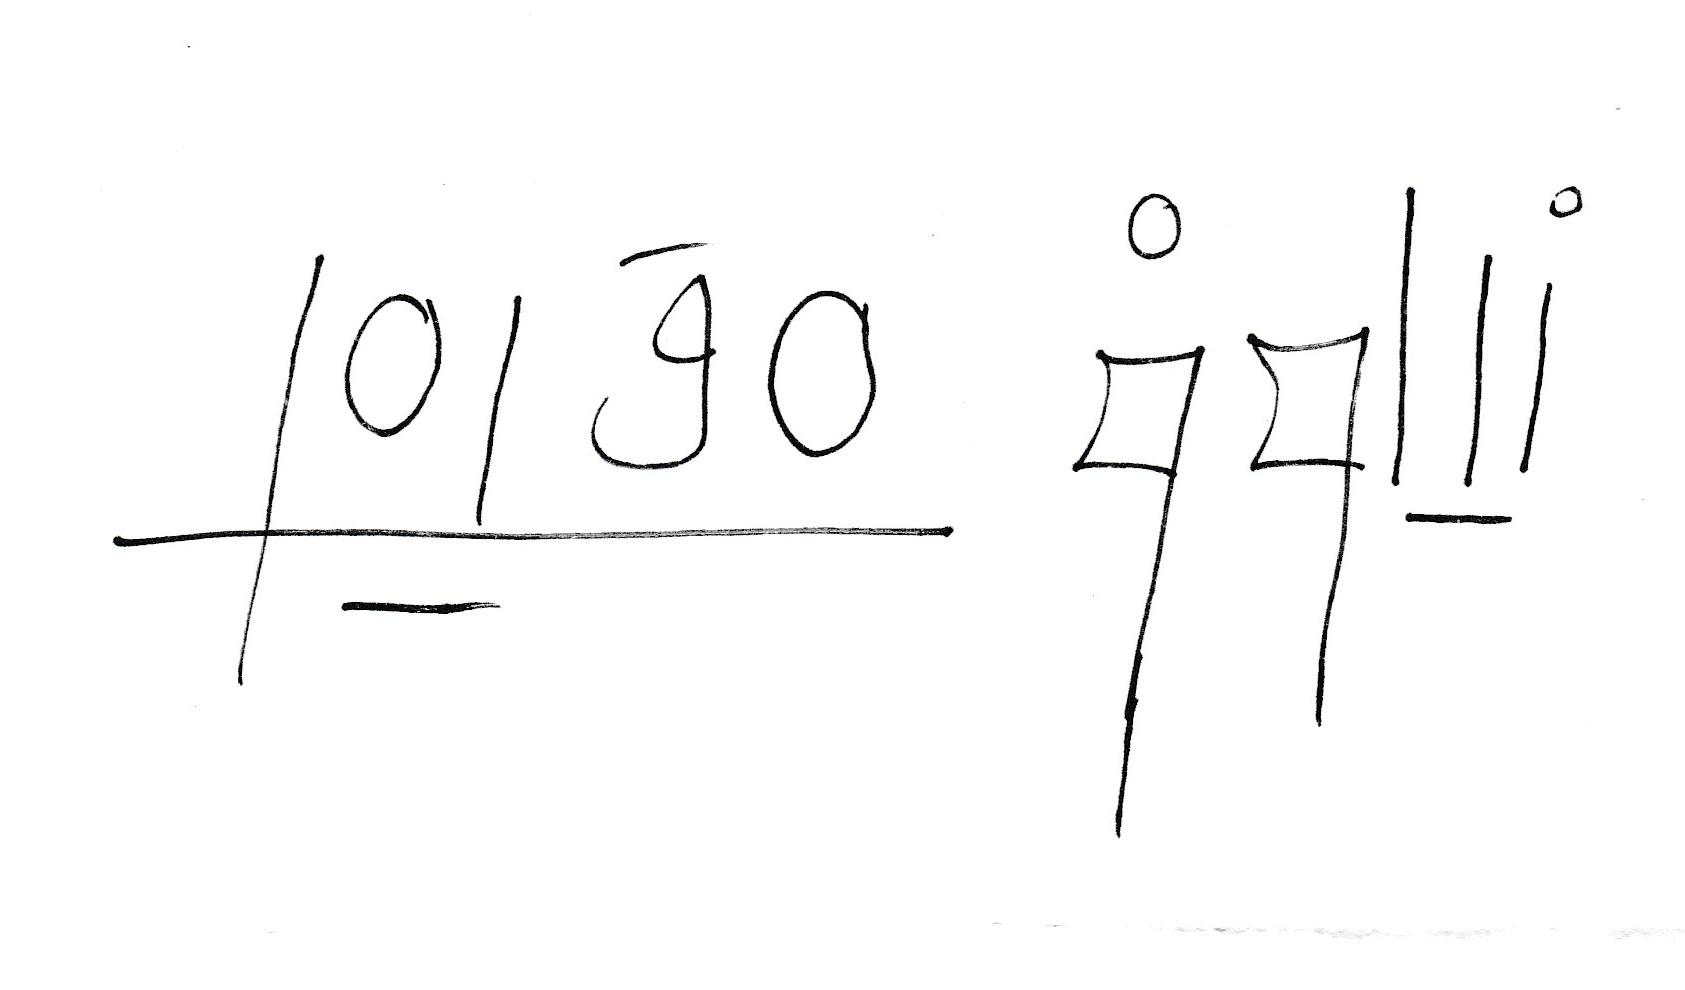 Niloofar Moghimi's Signature